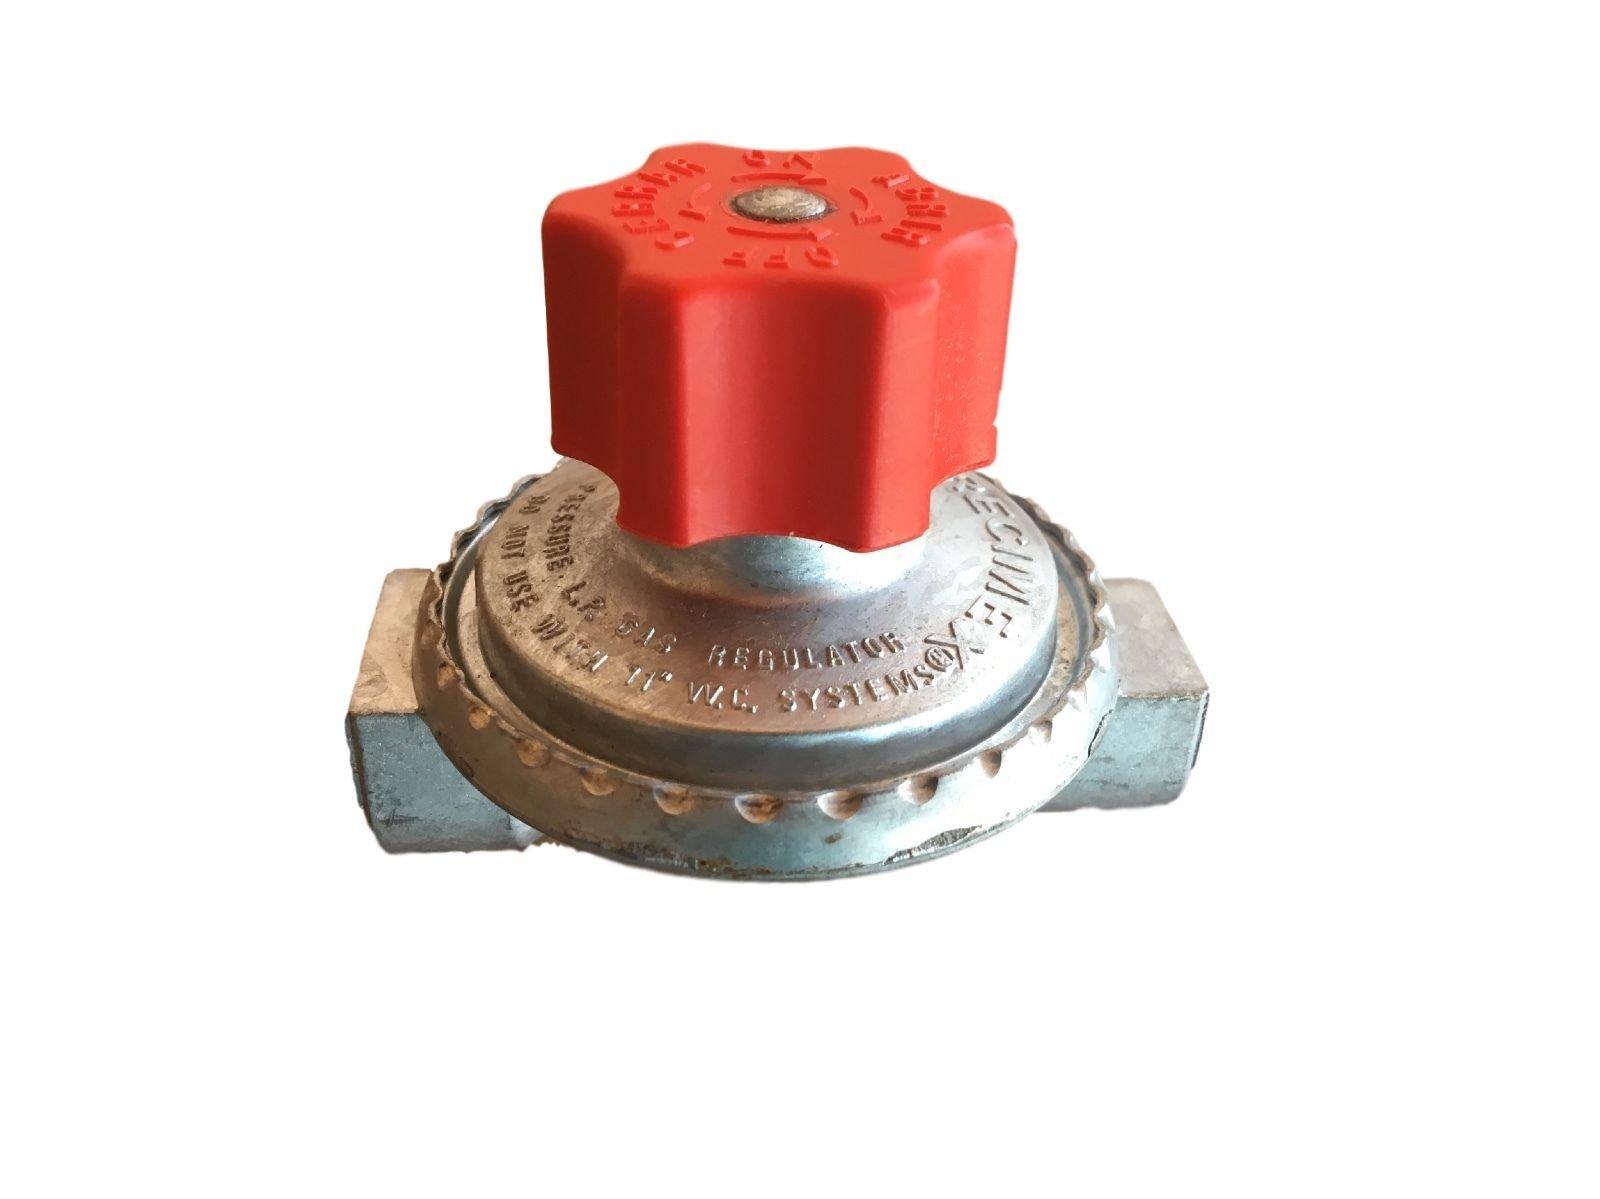 Adjustable 0 to 20psi Propane Regulator LP LPG Gas parts Precimex 7003